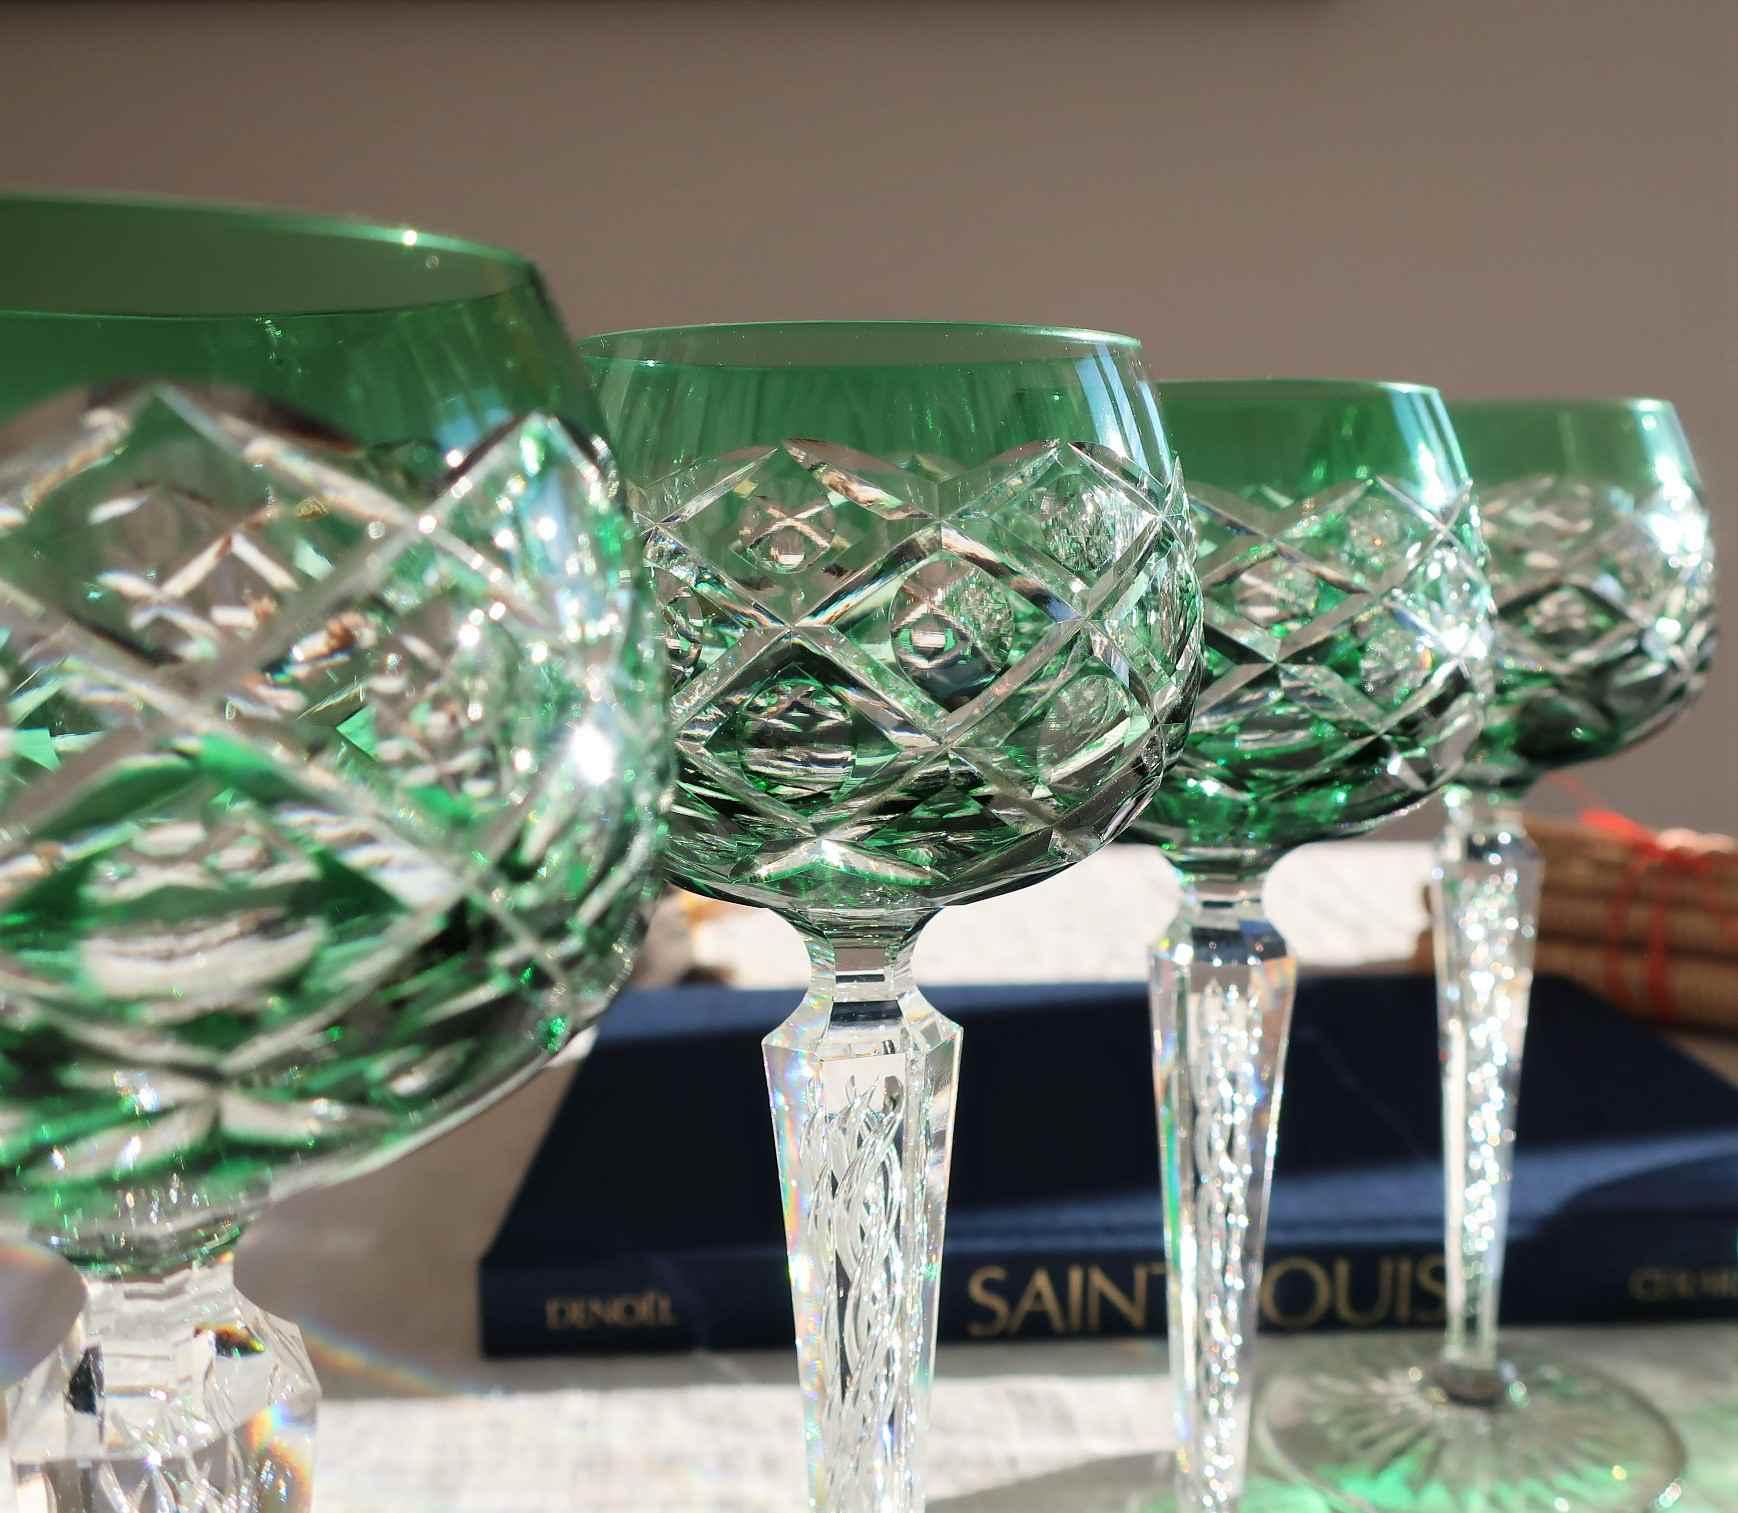 Roemer cristal Saint Louis.